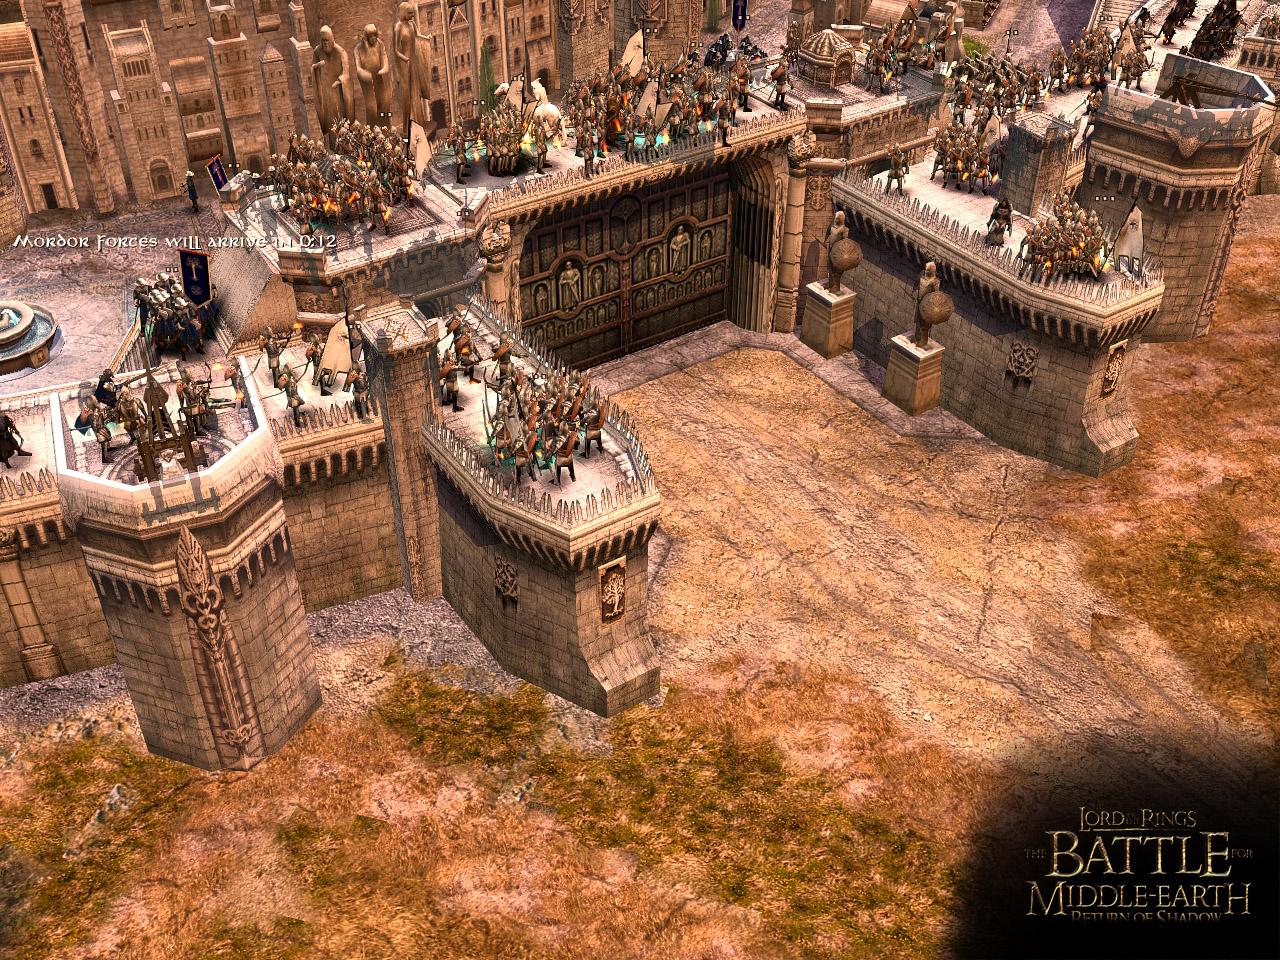 Gondor prepares for the siege